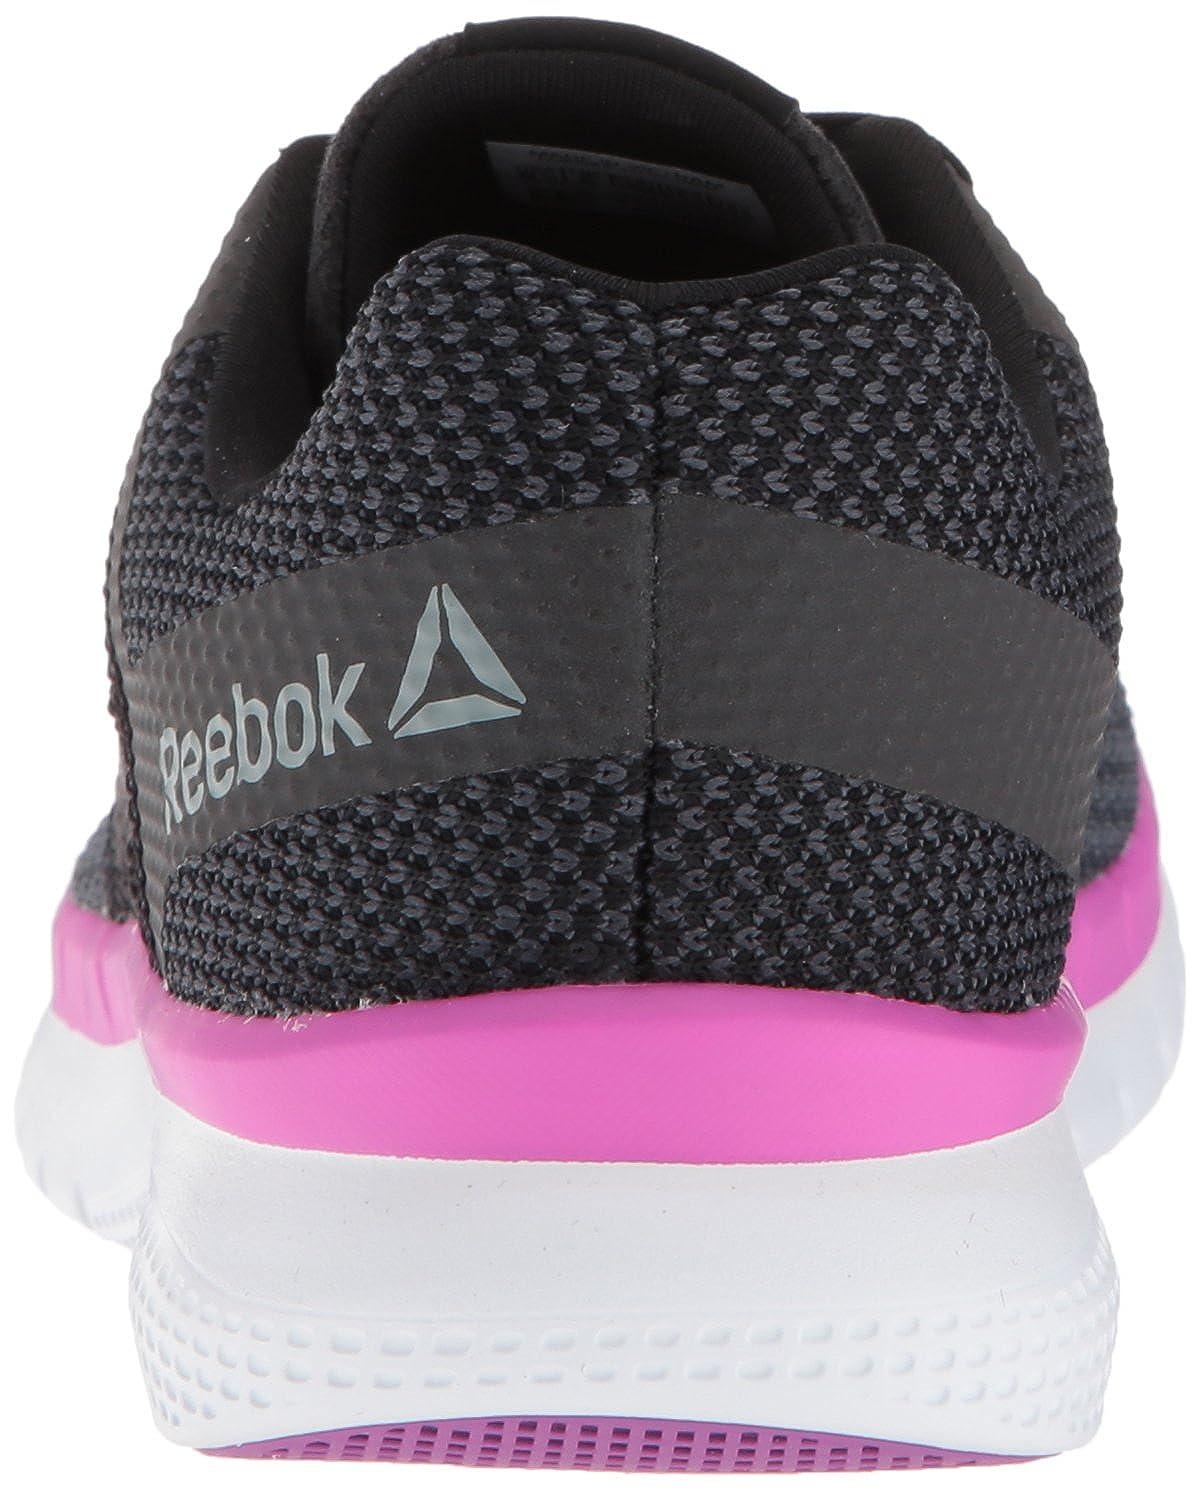 Reebok Womens Print Prime Runner Sneaker